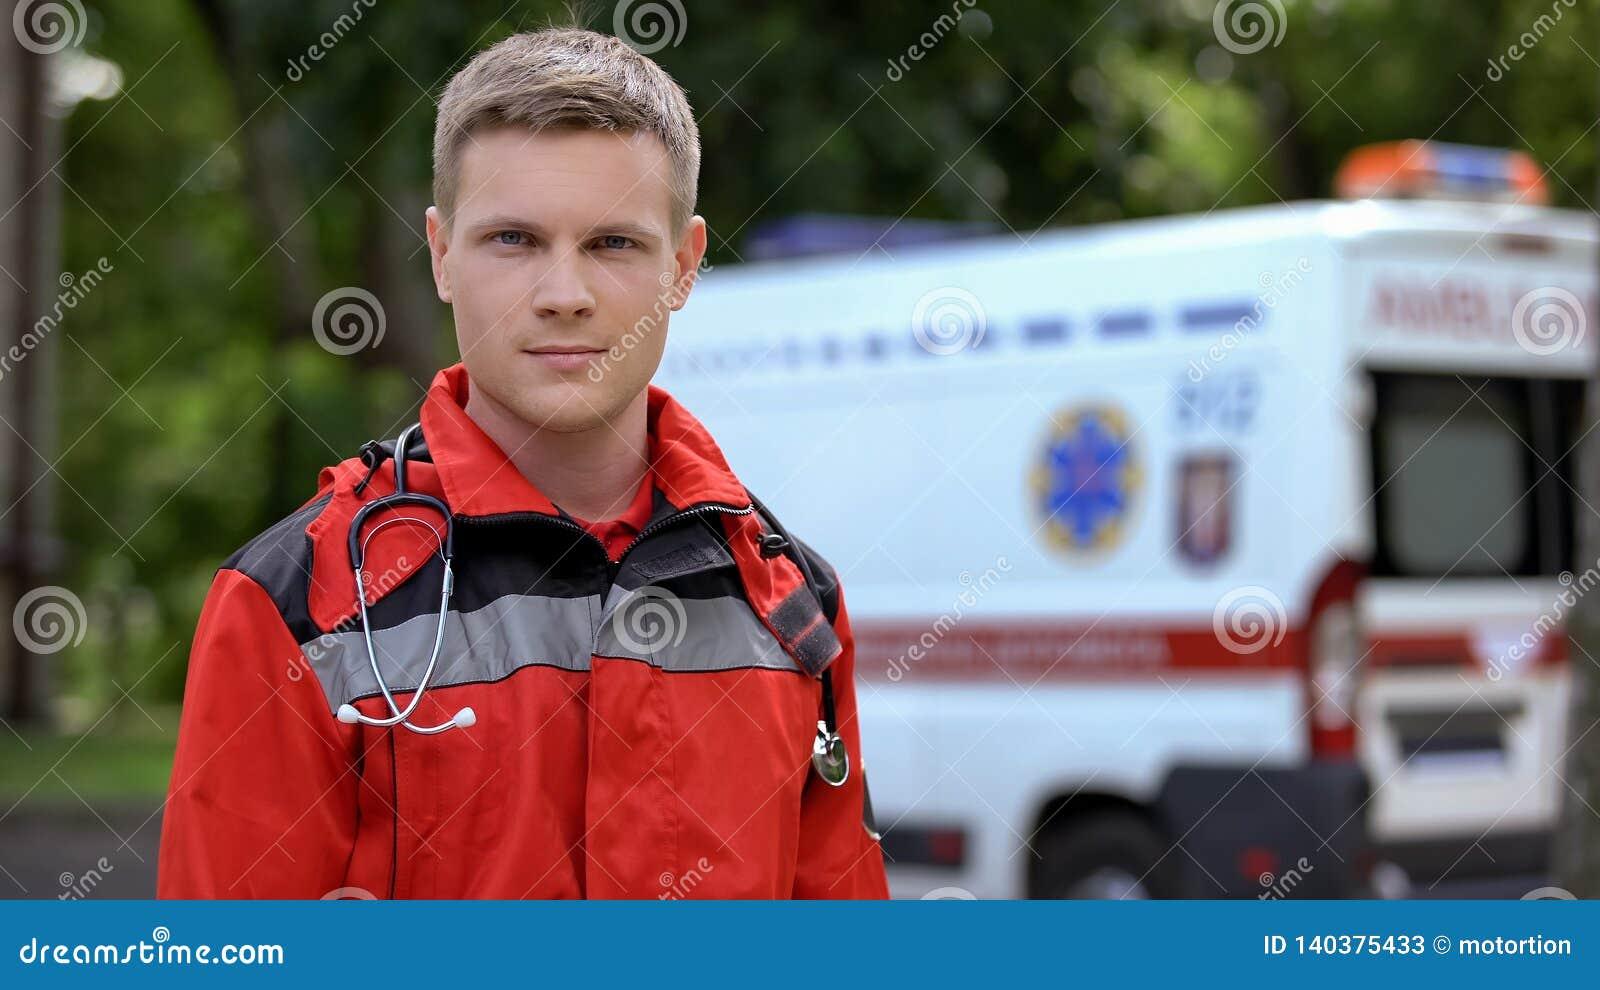 Male paramedic posing for camera, ambulance on background, professionalism